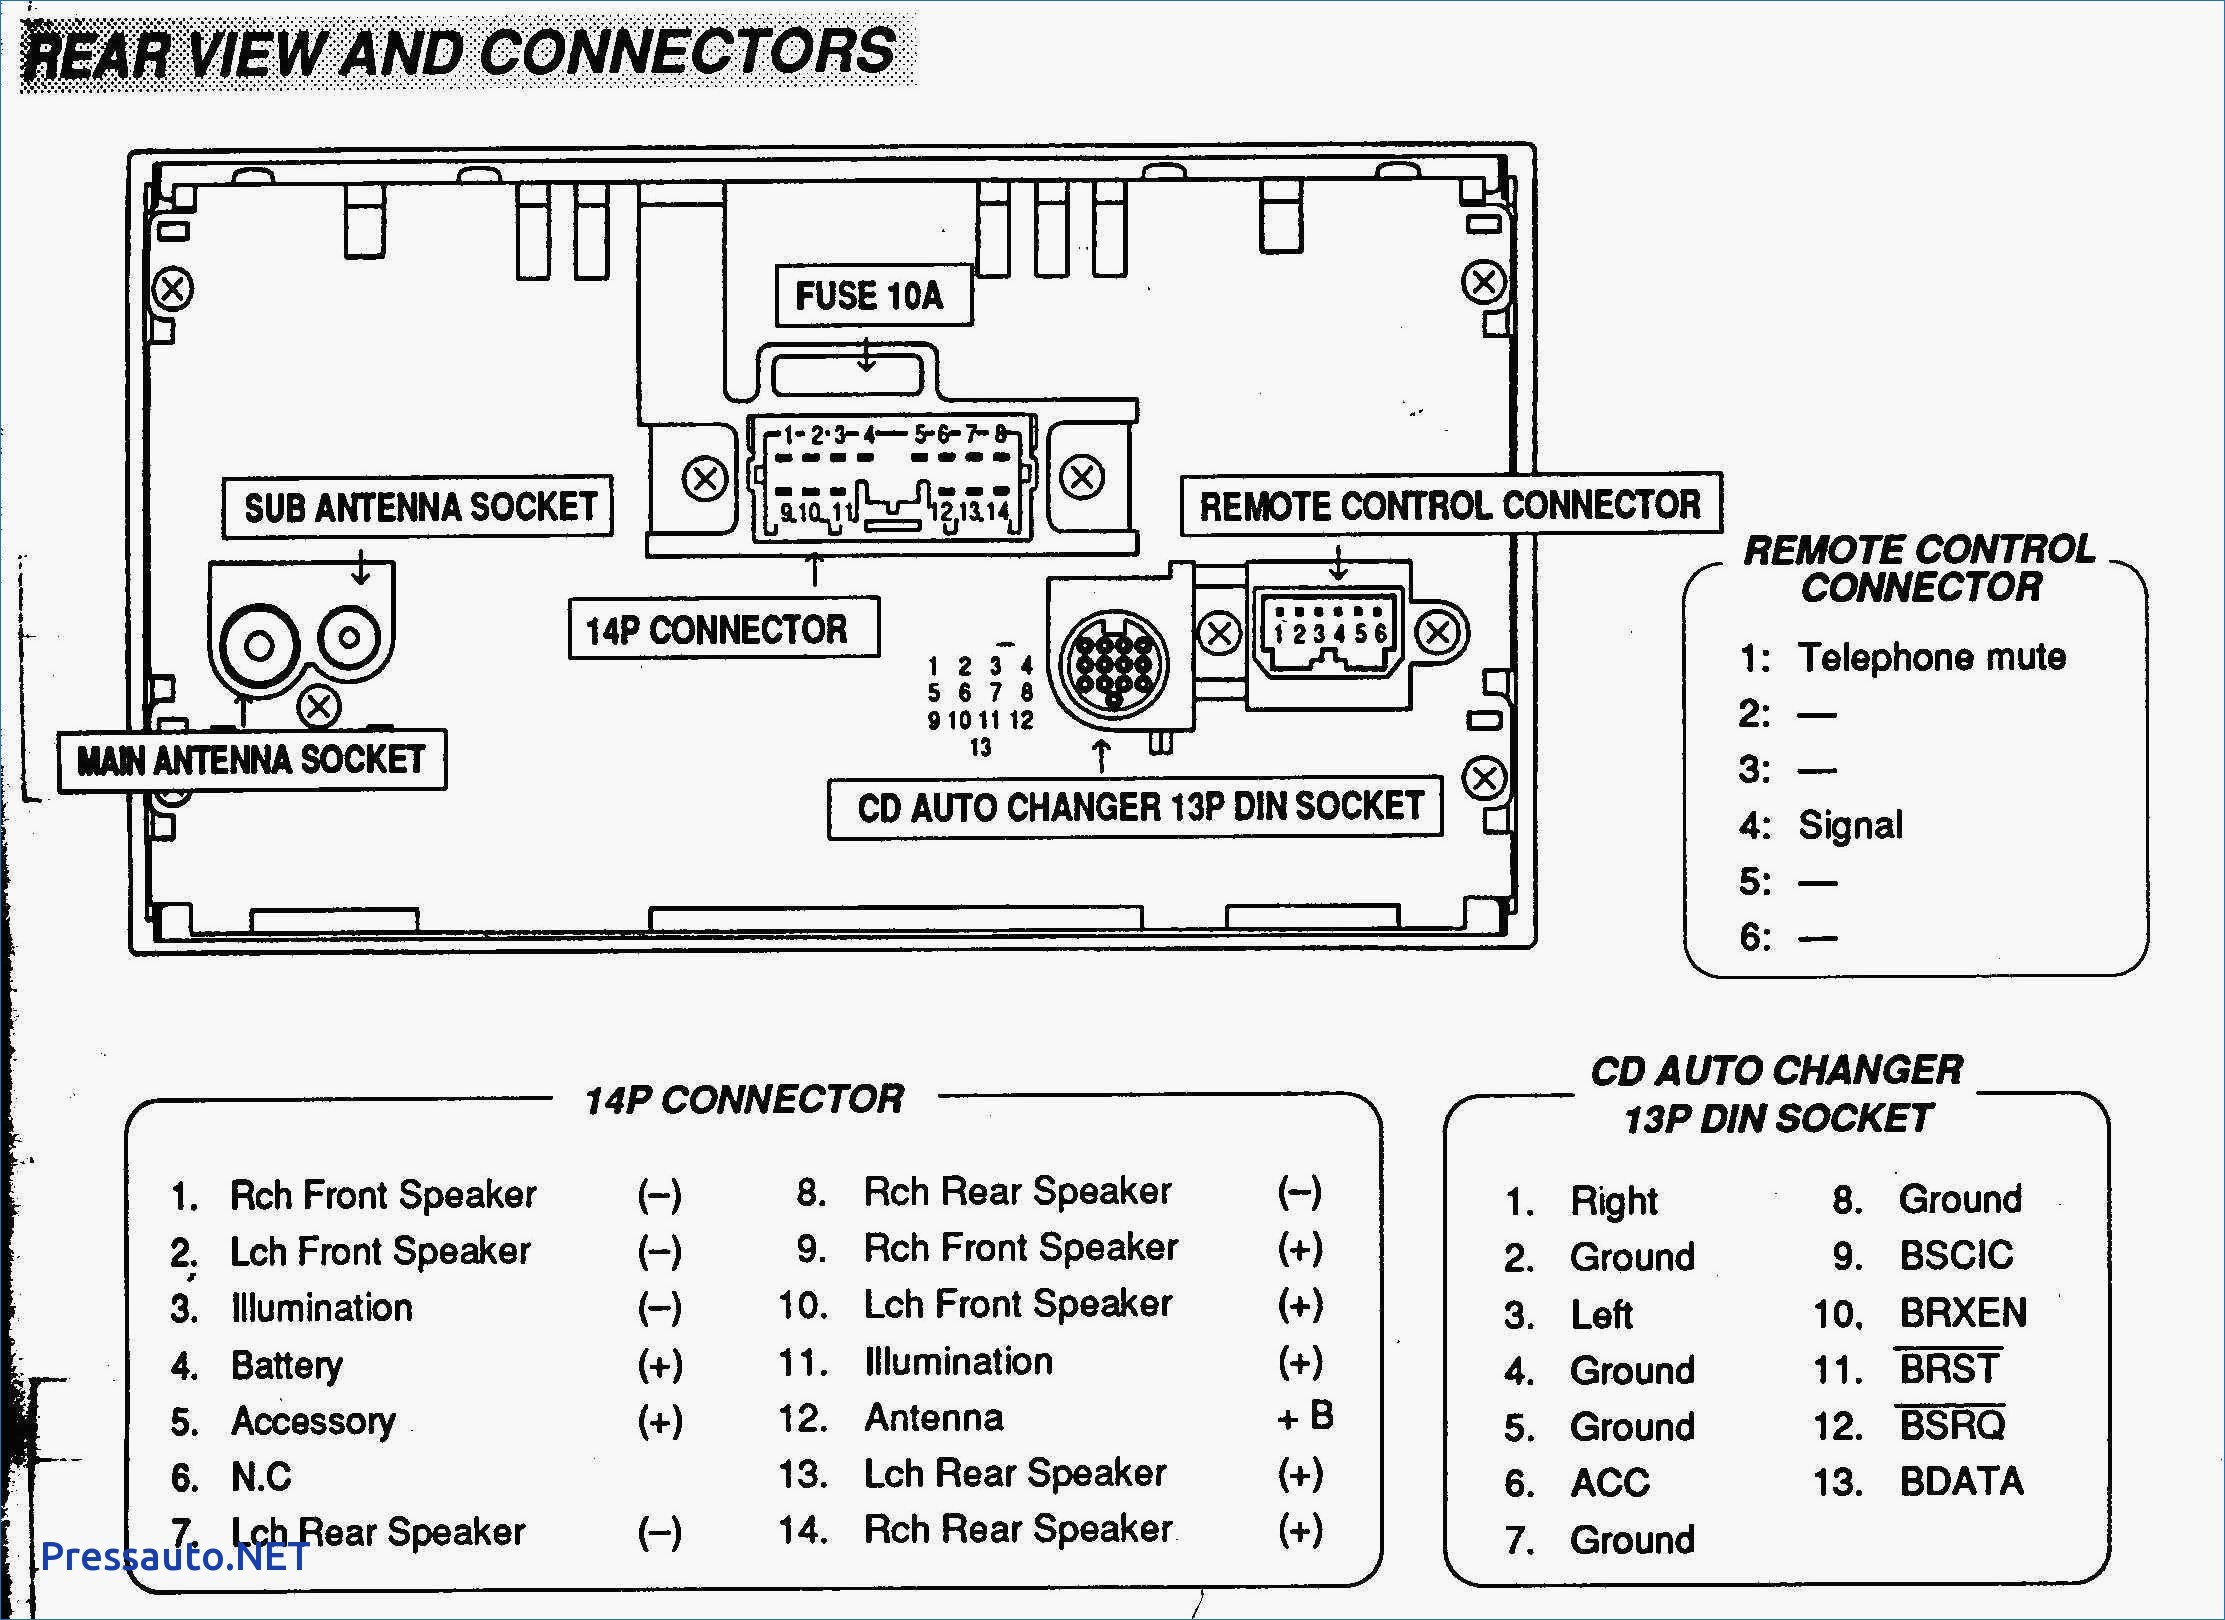 Vw Passat Engine Diagram 03 Jetta 2 0 Engine Diagram Another Blog About Wiring Diagram • Of Vw Passat Engine Diagram